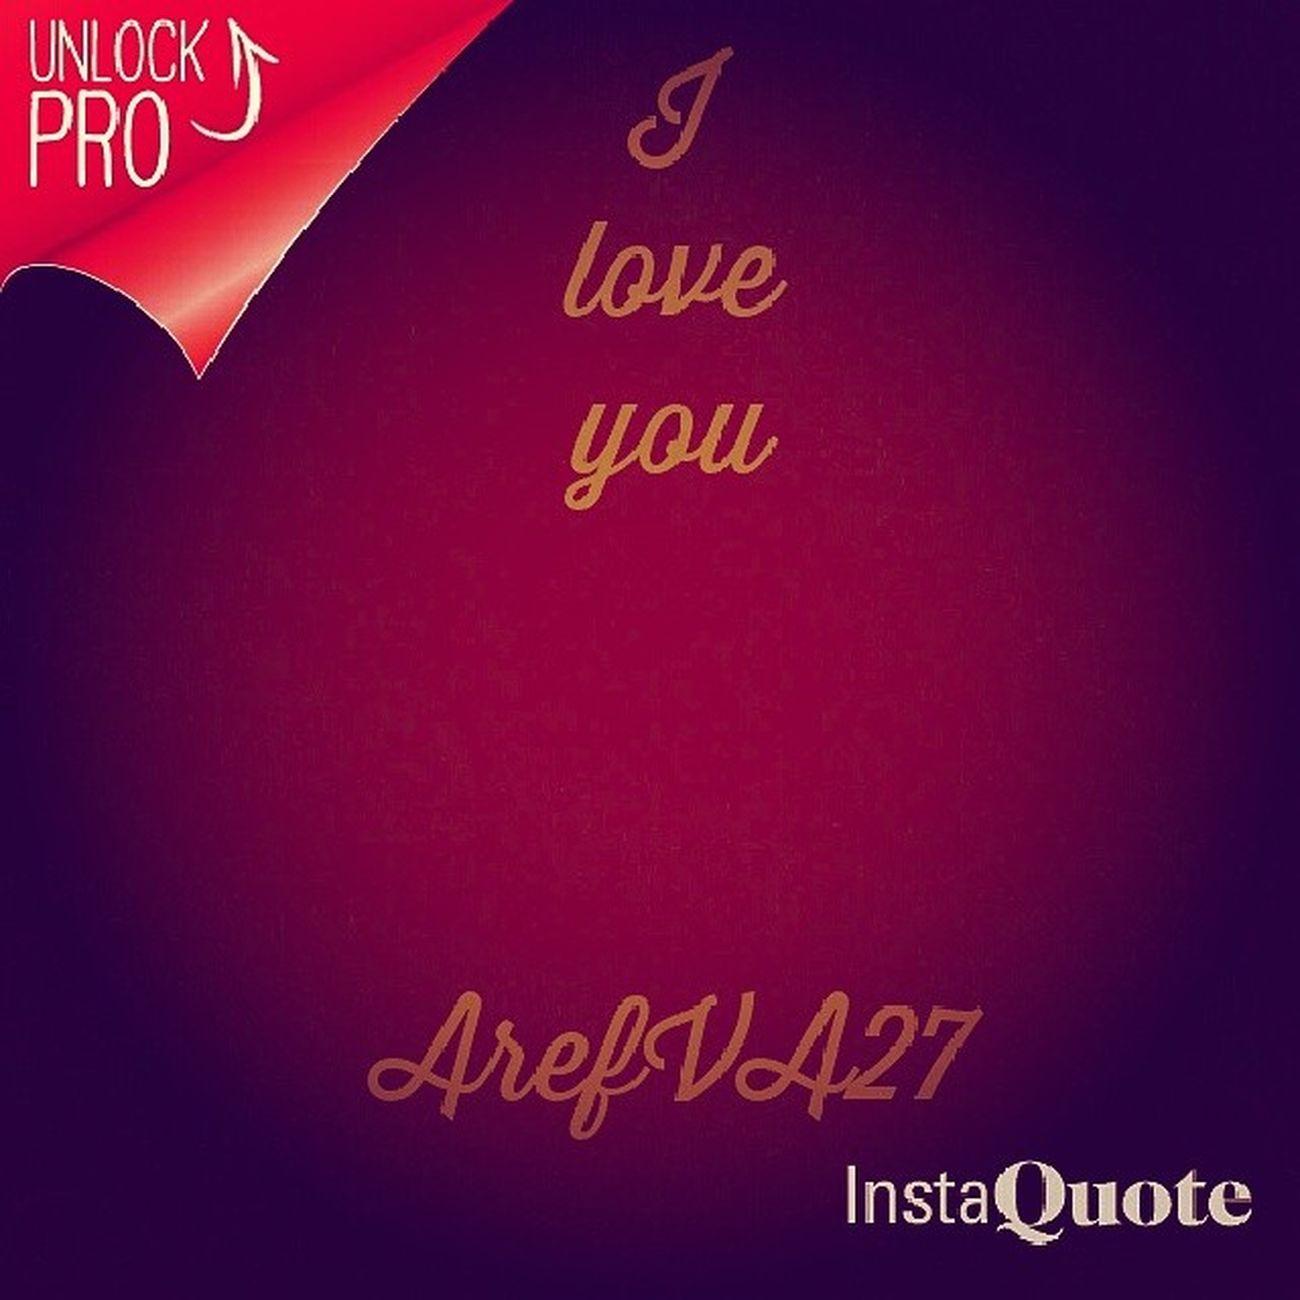 Arefva27 Like Follow 4 follow iloveyou